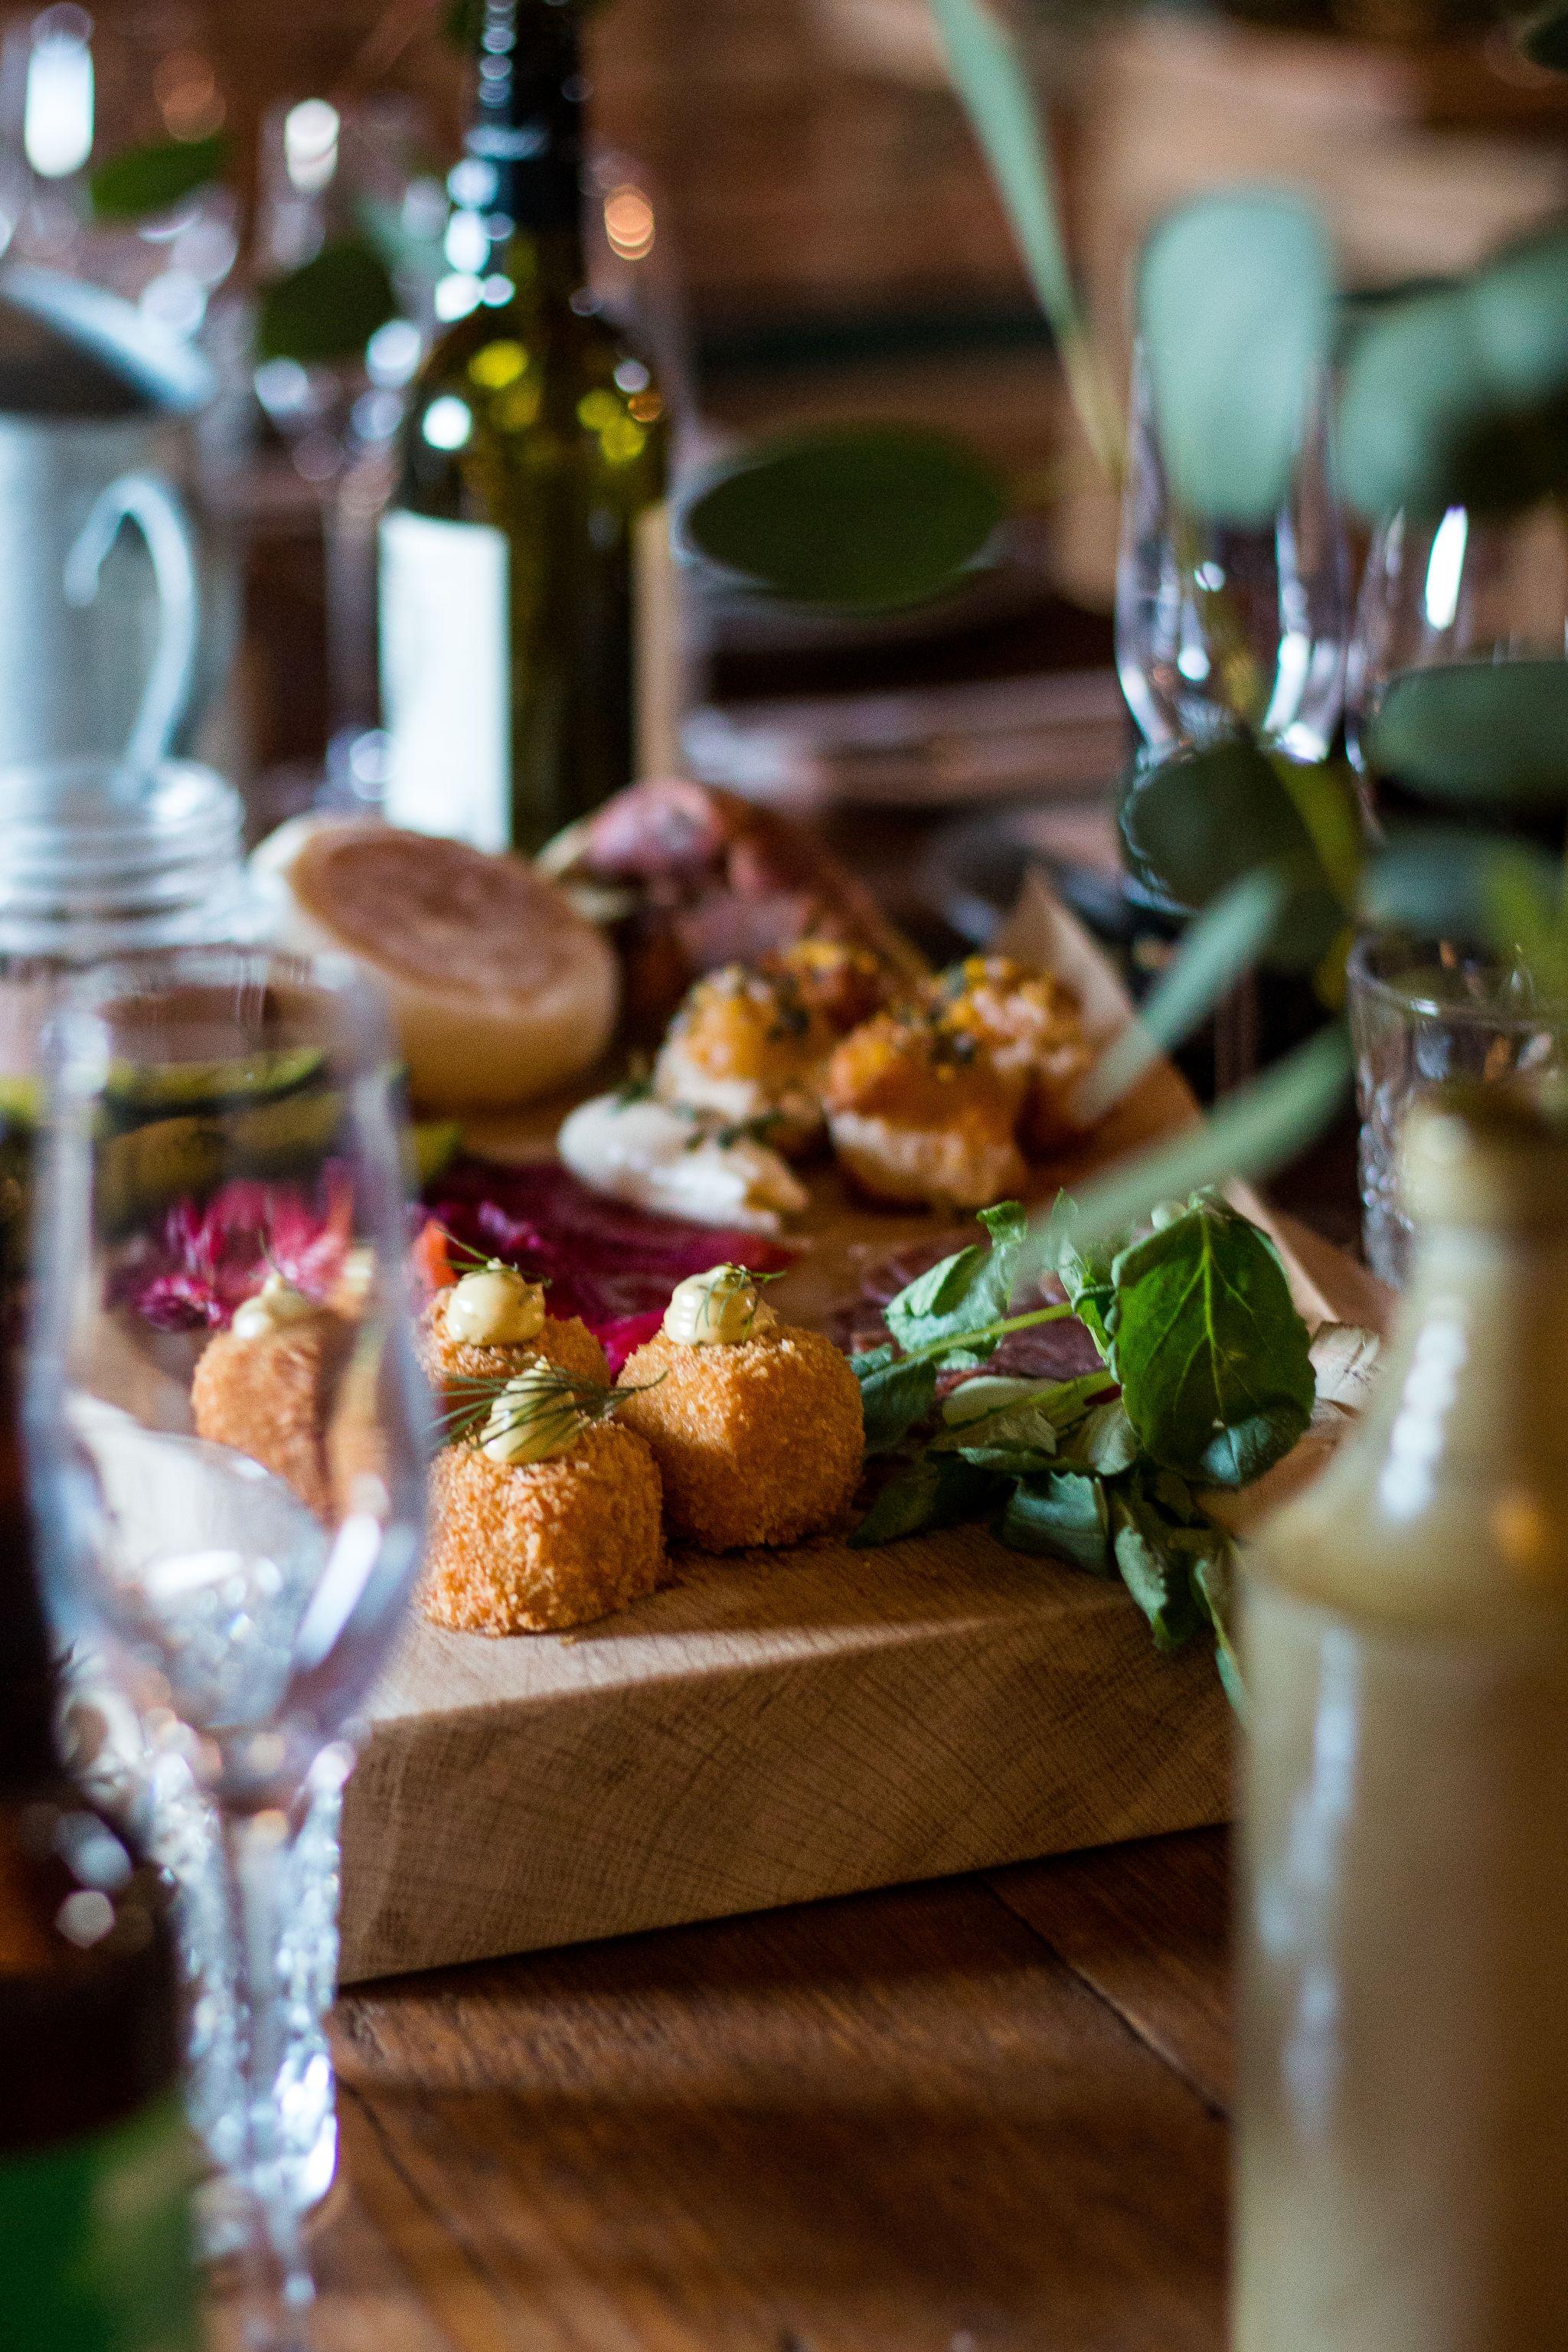 bonded warehouse food photography sunderland food wedding menu